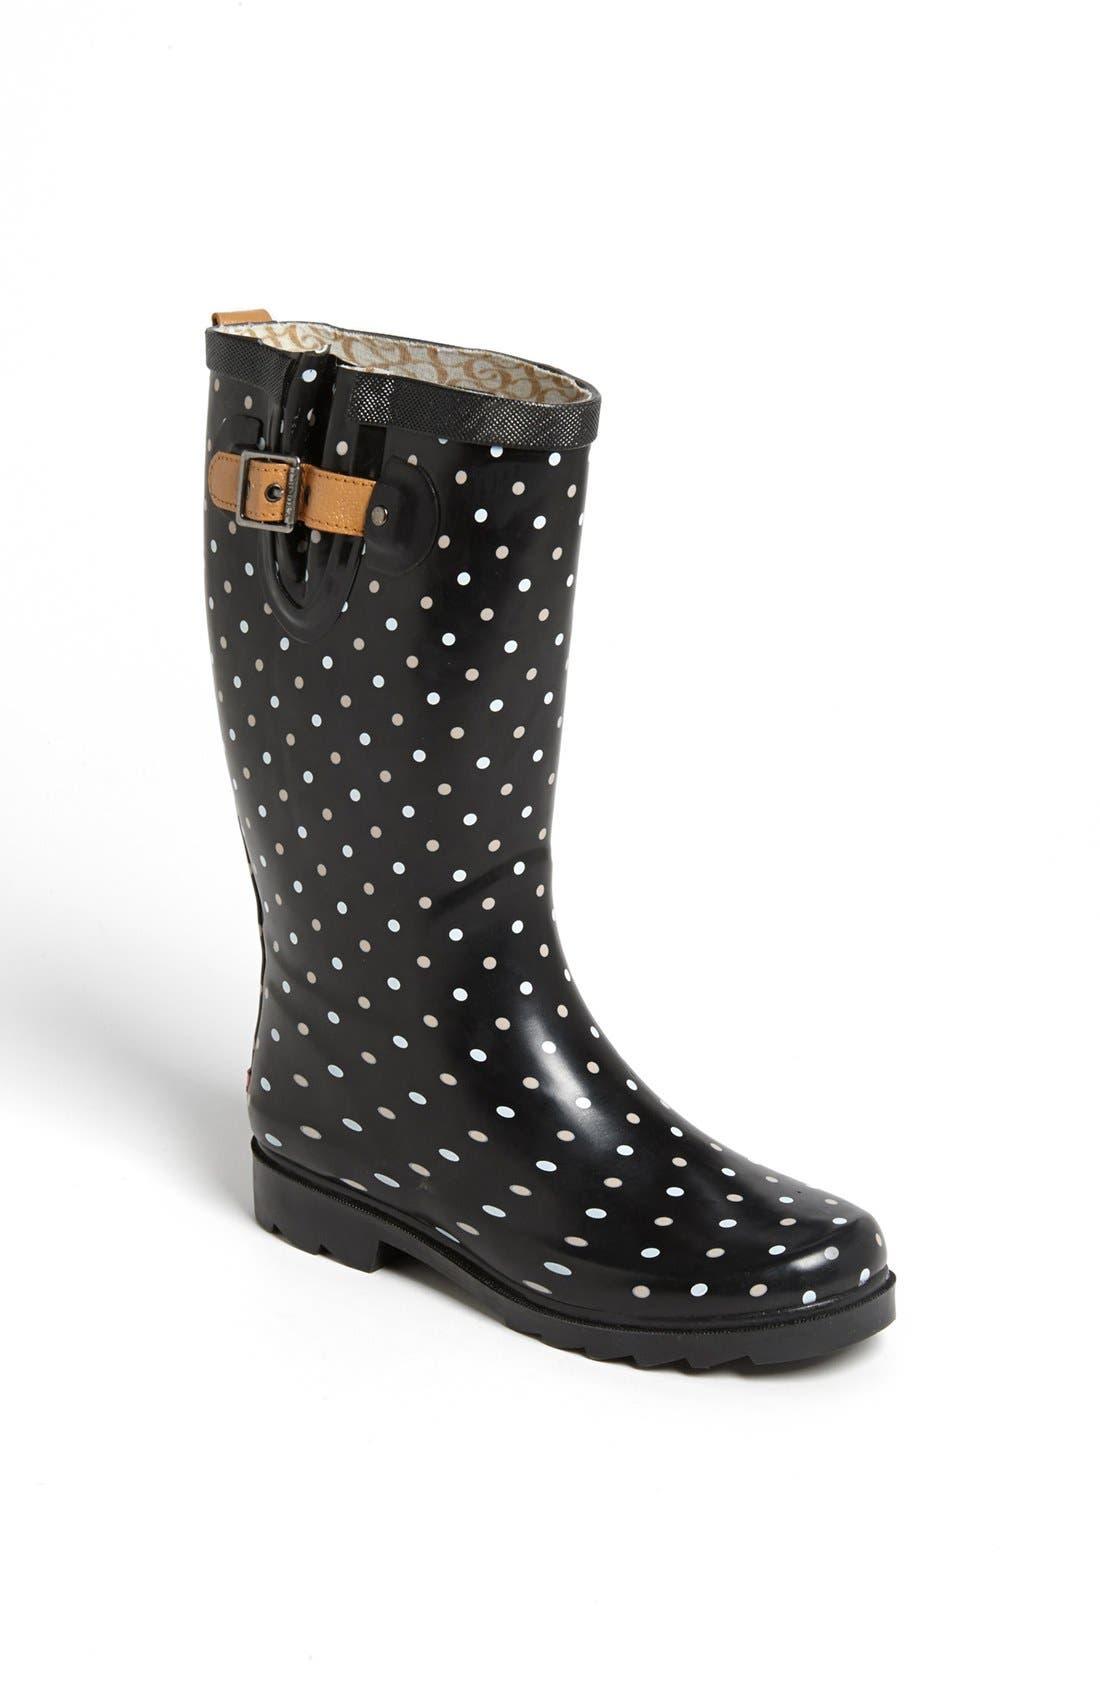 Main Image - Chooka 'Classical Dot' Rain Boot (Women)